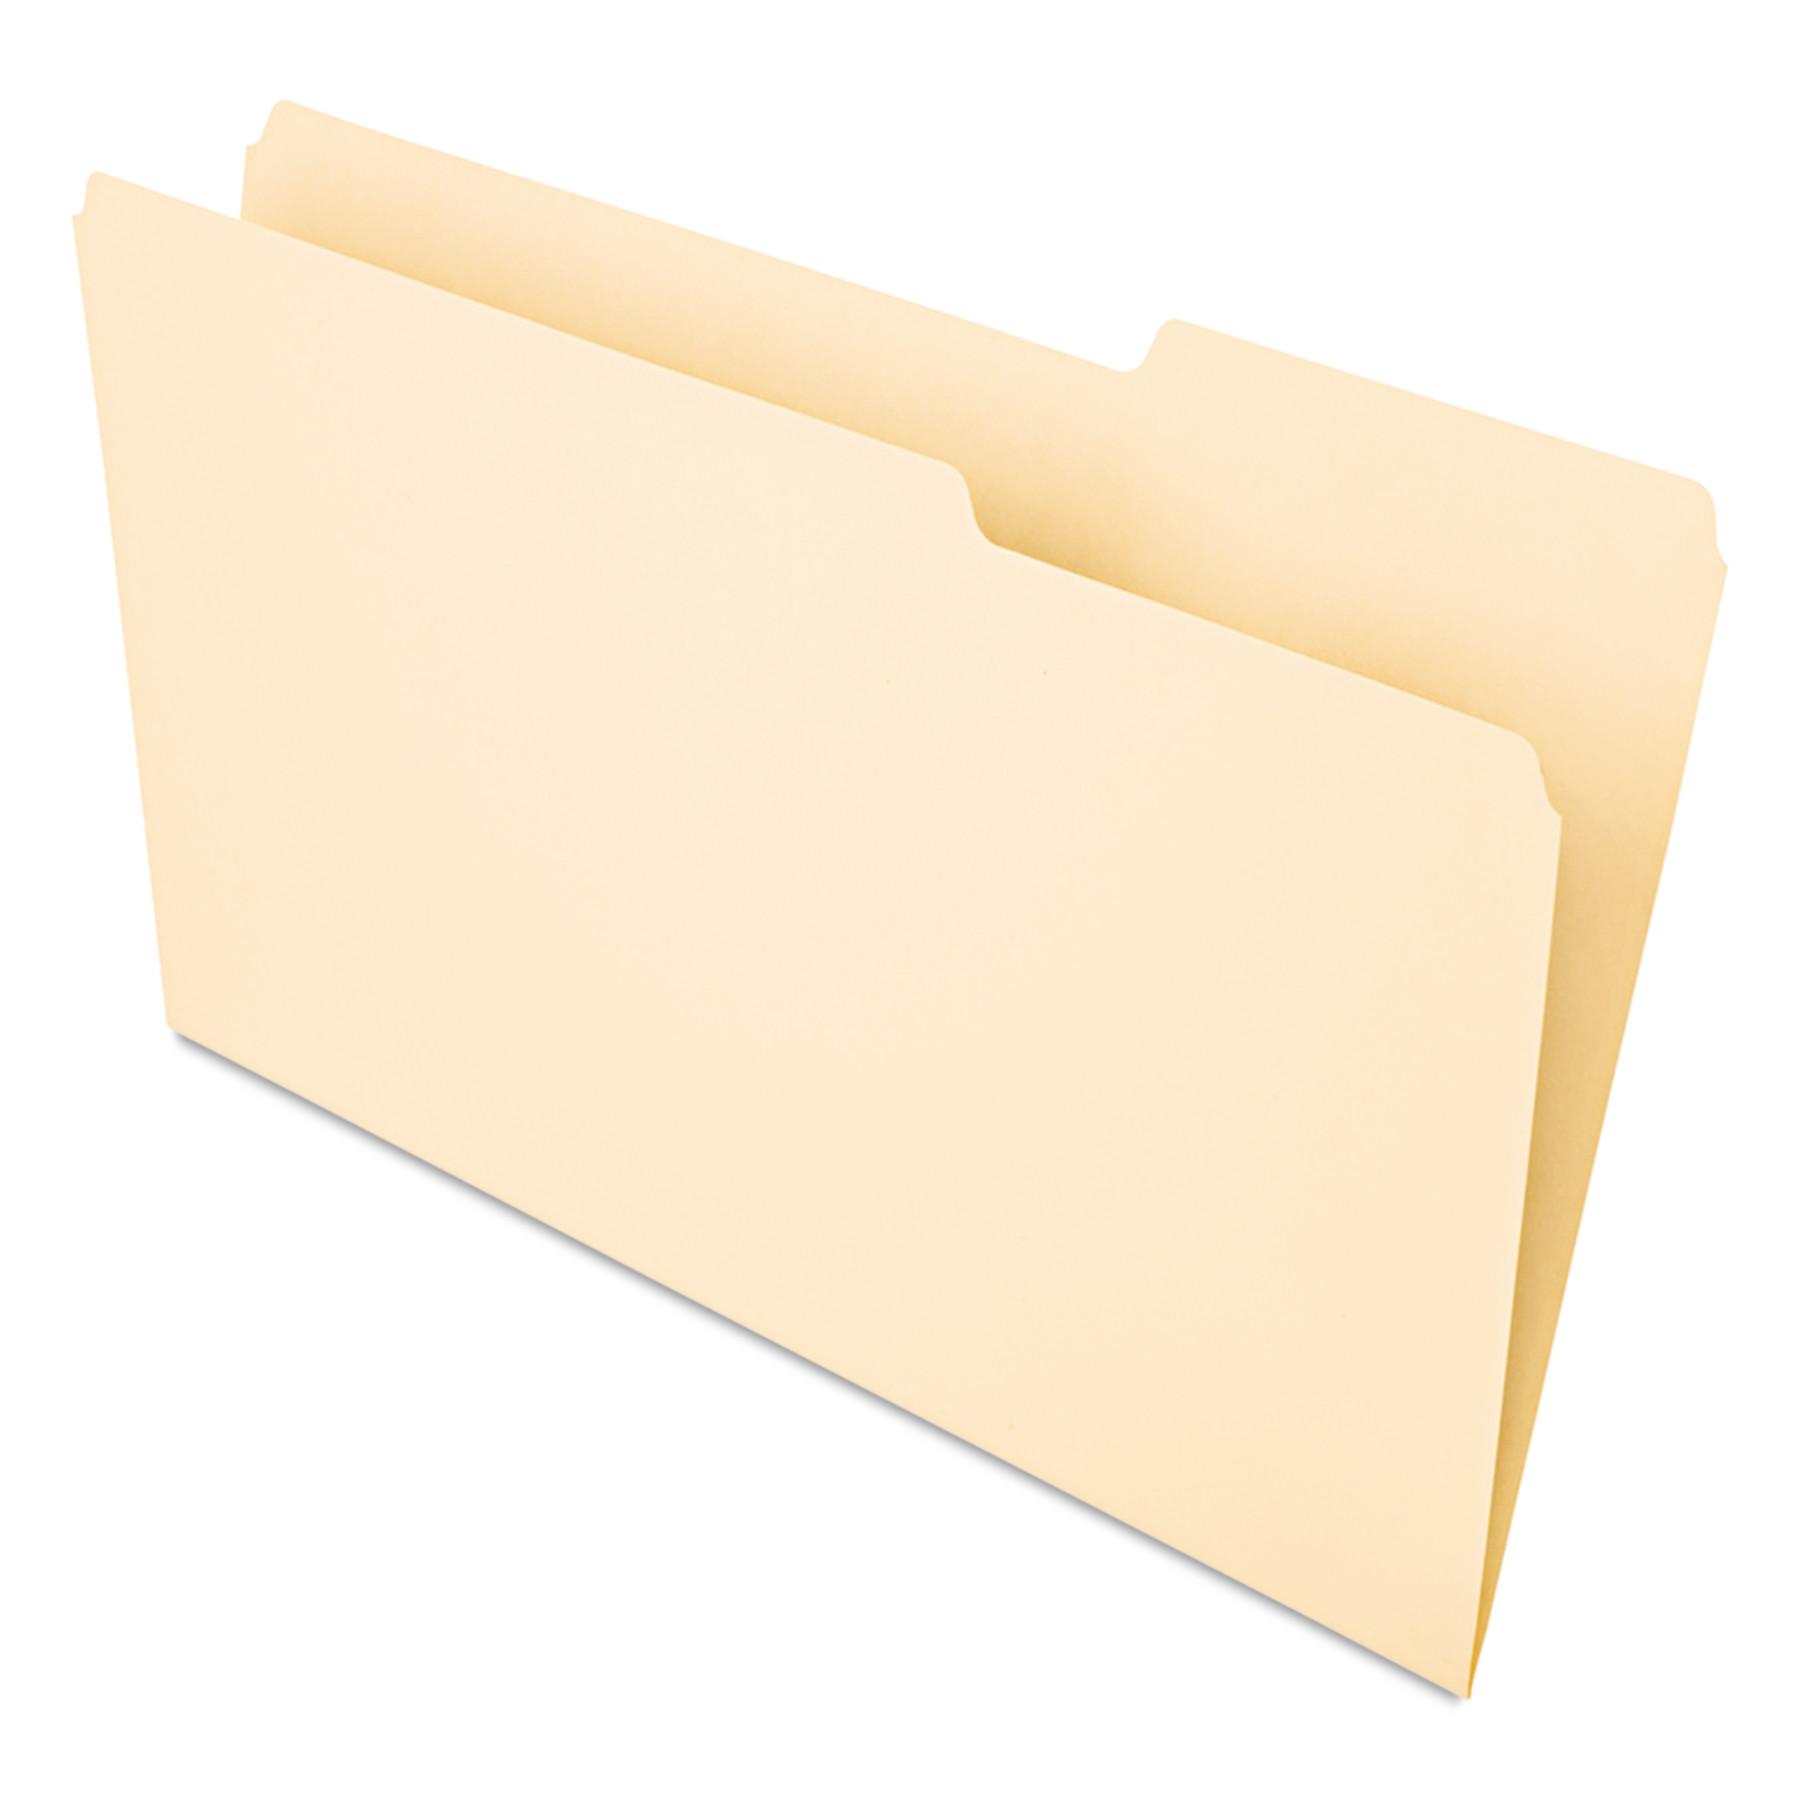 Recycled Interior File Folders, 1/3 Cut Top Tab, Legal, Manila, 100/Box